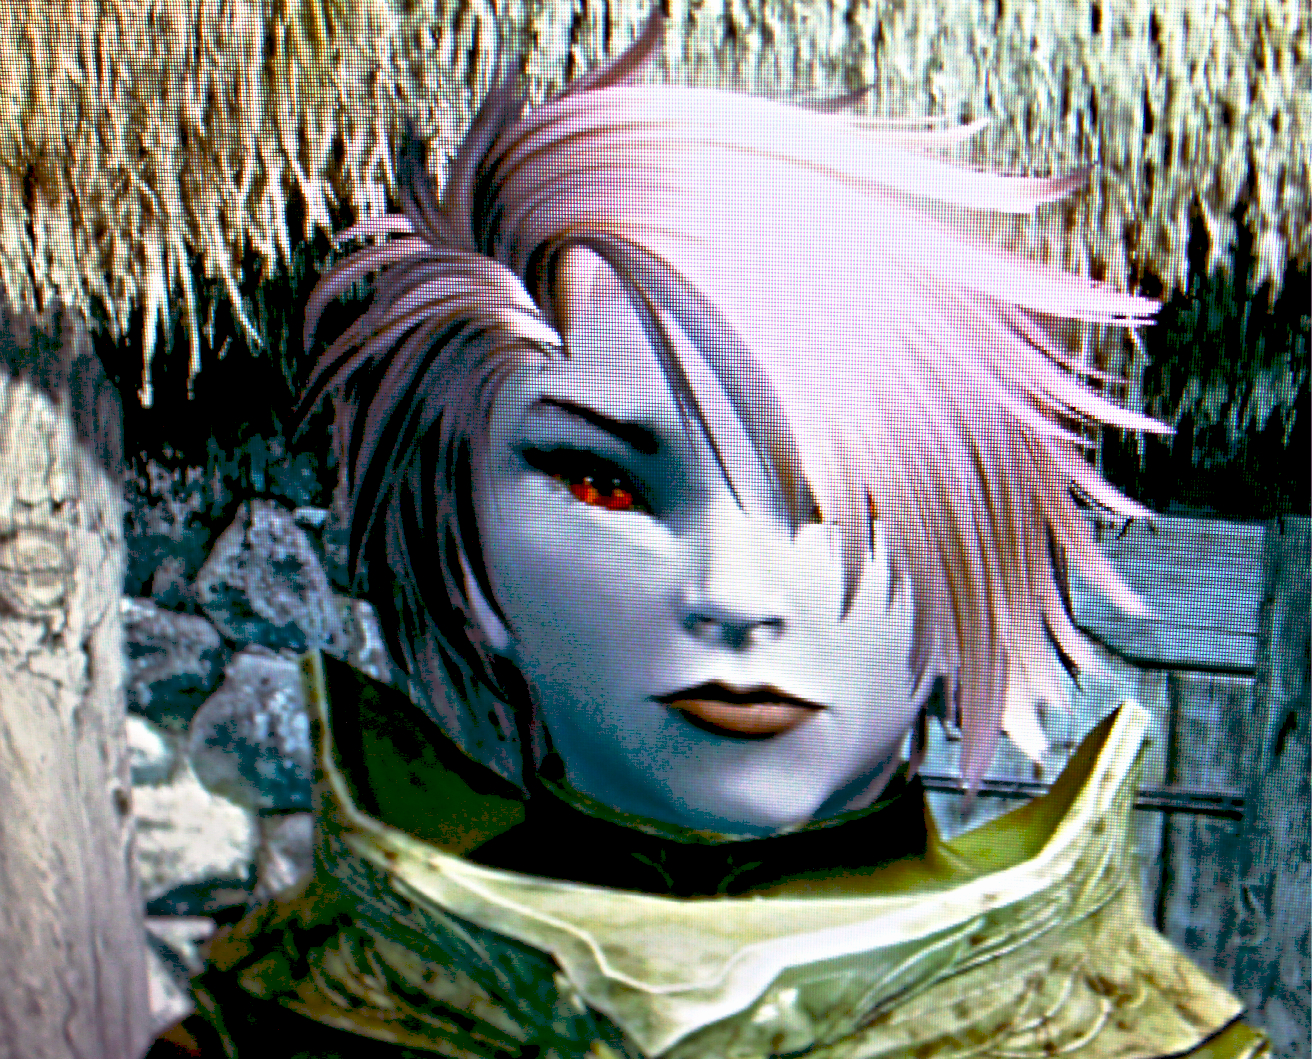 Mirava - Skyrim Assassin by LemonicDemon